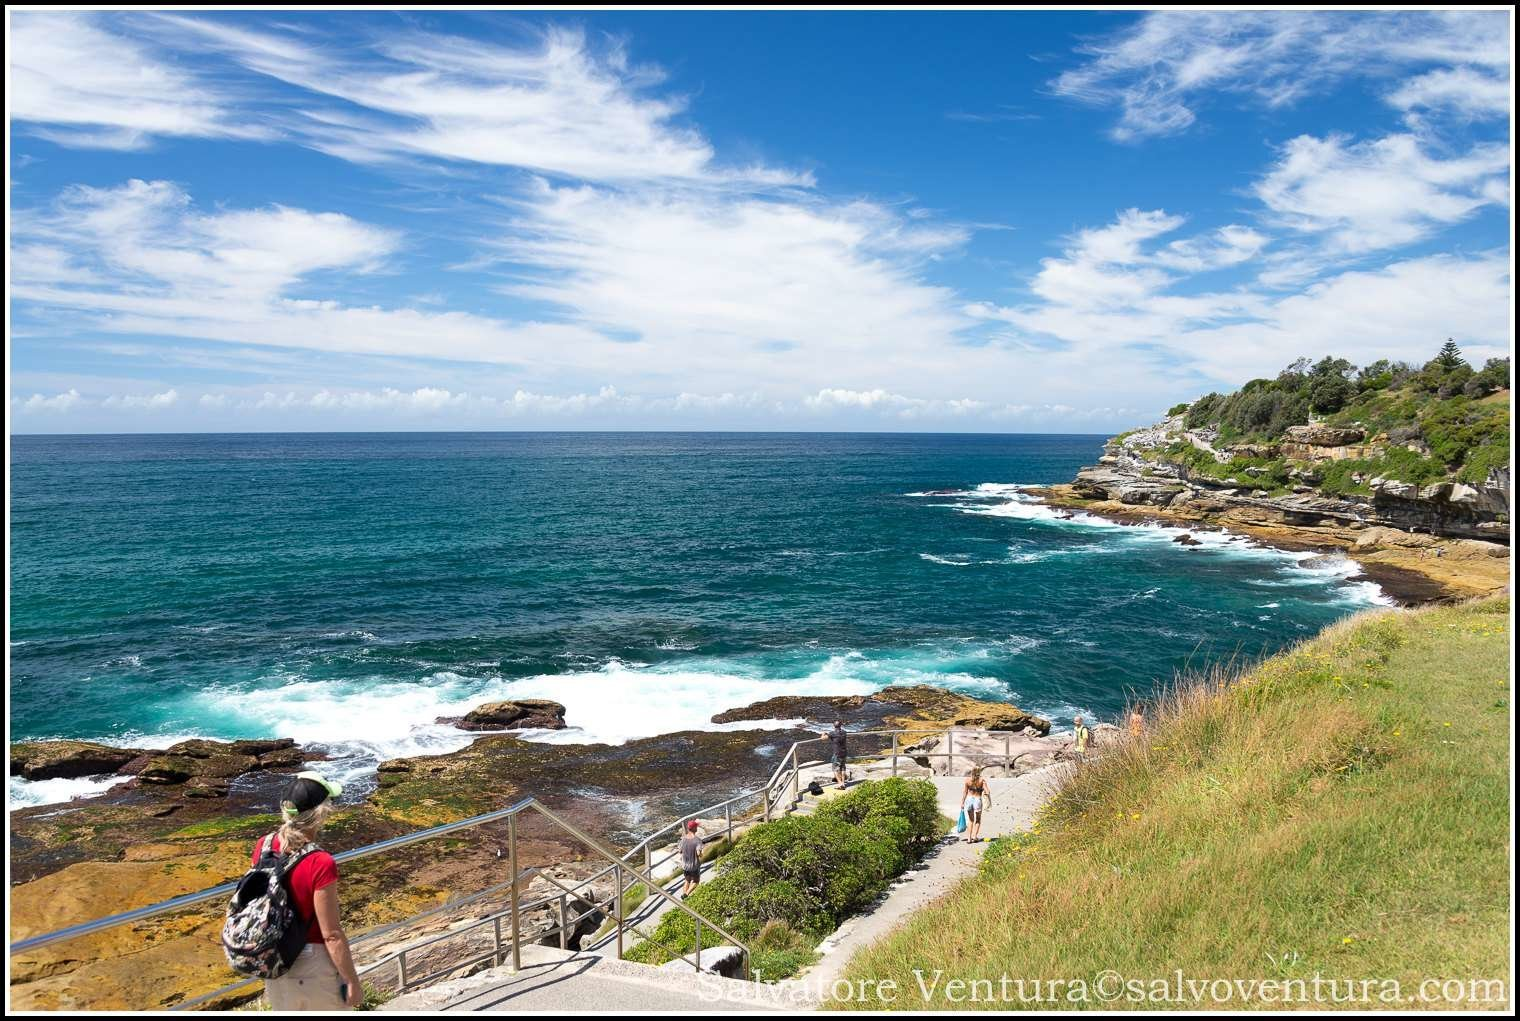 2016.03.05 Sydney Bondi to Coogee coastal hike-salvoventura-blog-DSC_6786